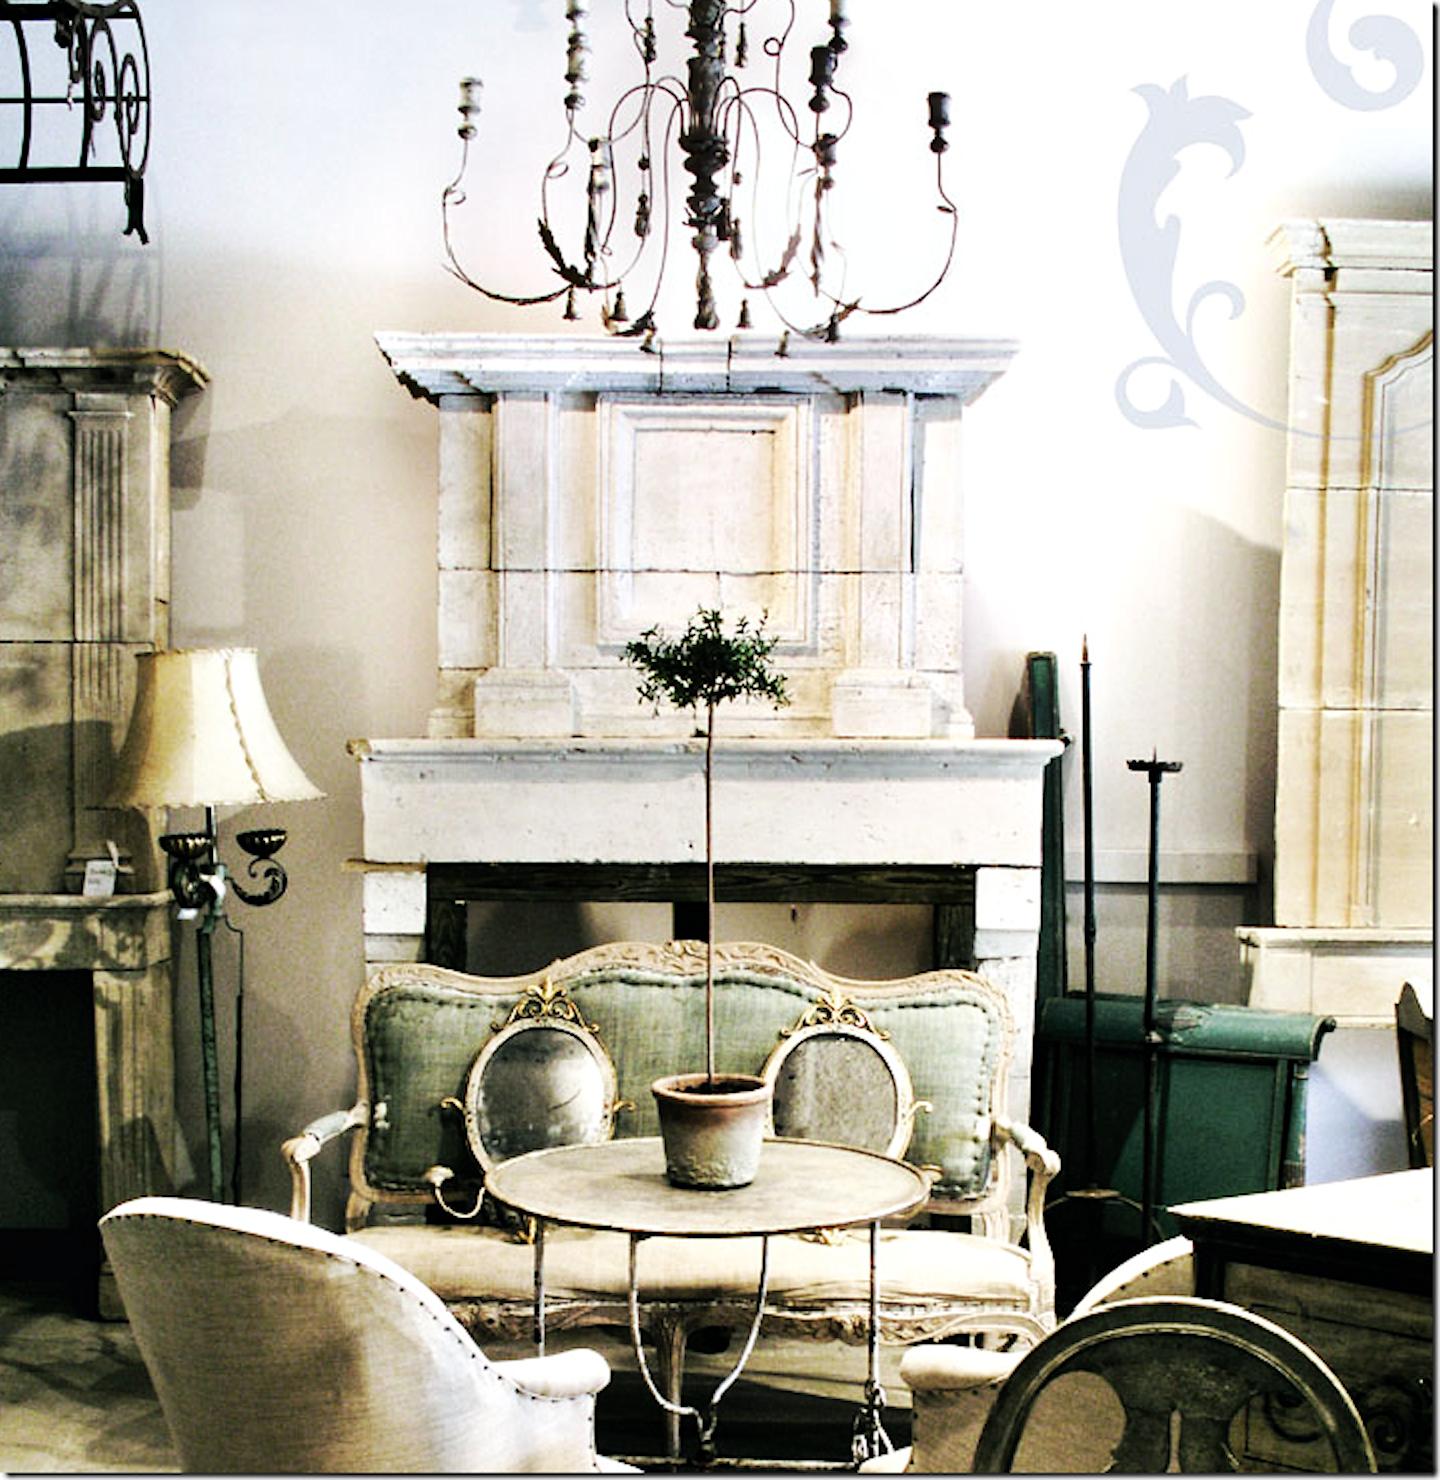 Simple Everyday Glamour Monday Inspiration#Dearthdesign #Austin #Texas #Home #Builder #Livingroom